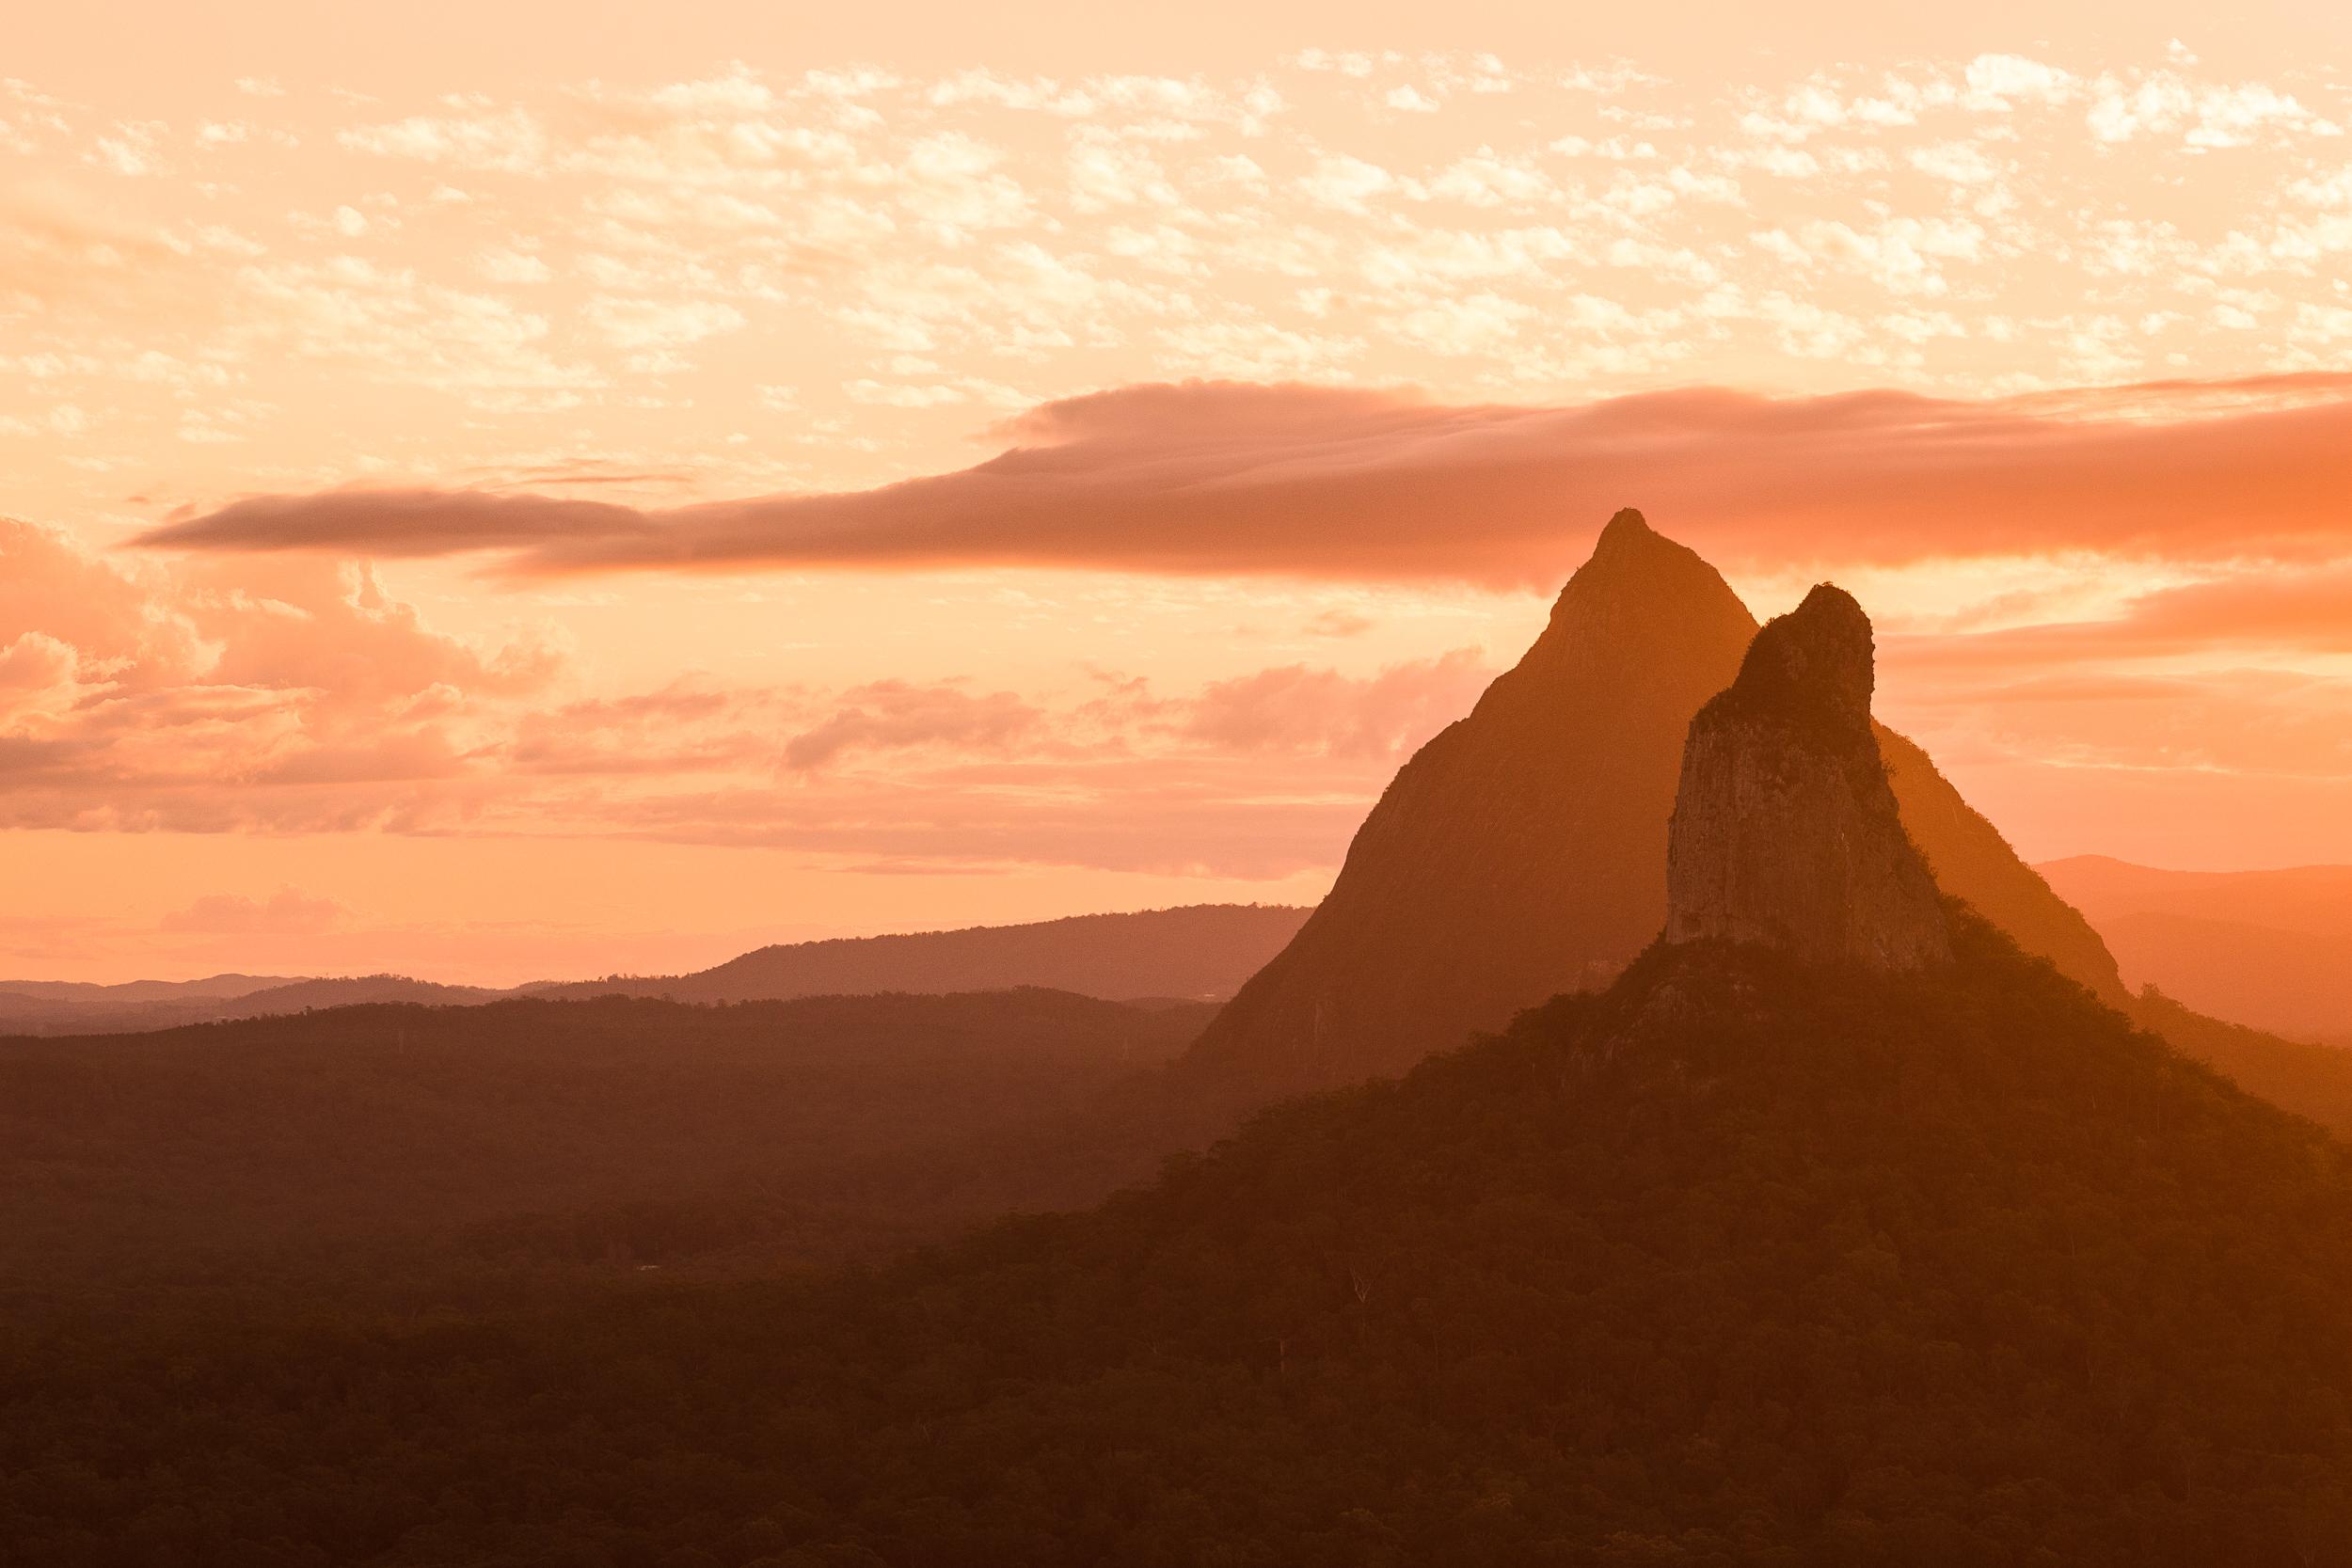 Sunset summit view from Mount Ngungun.